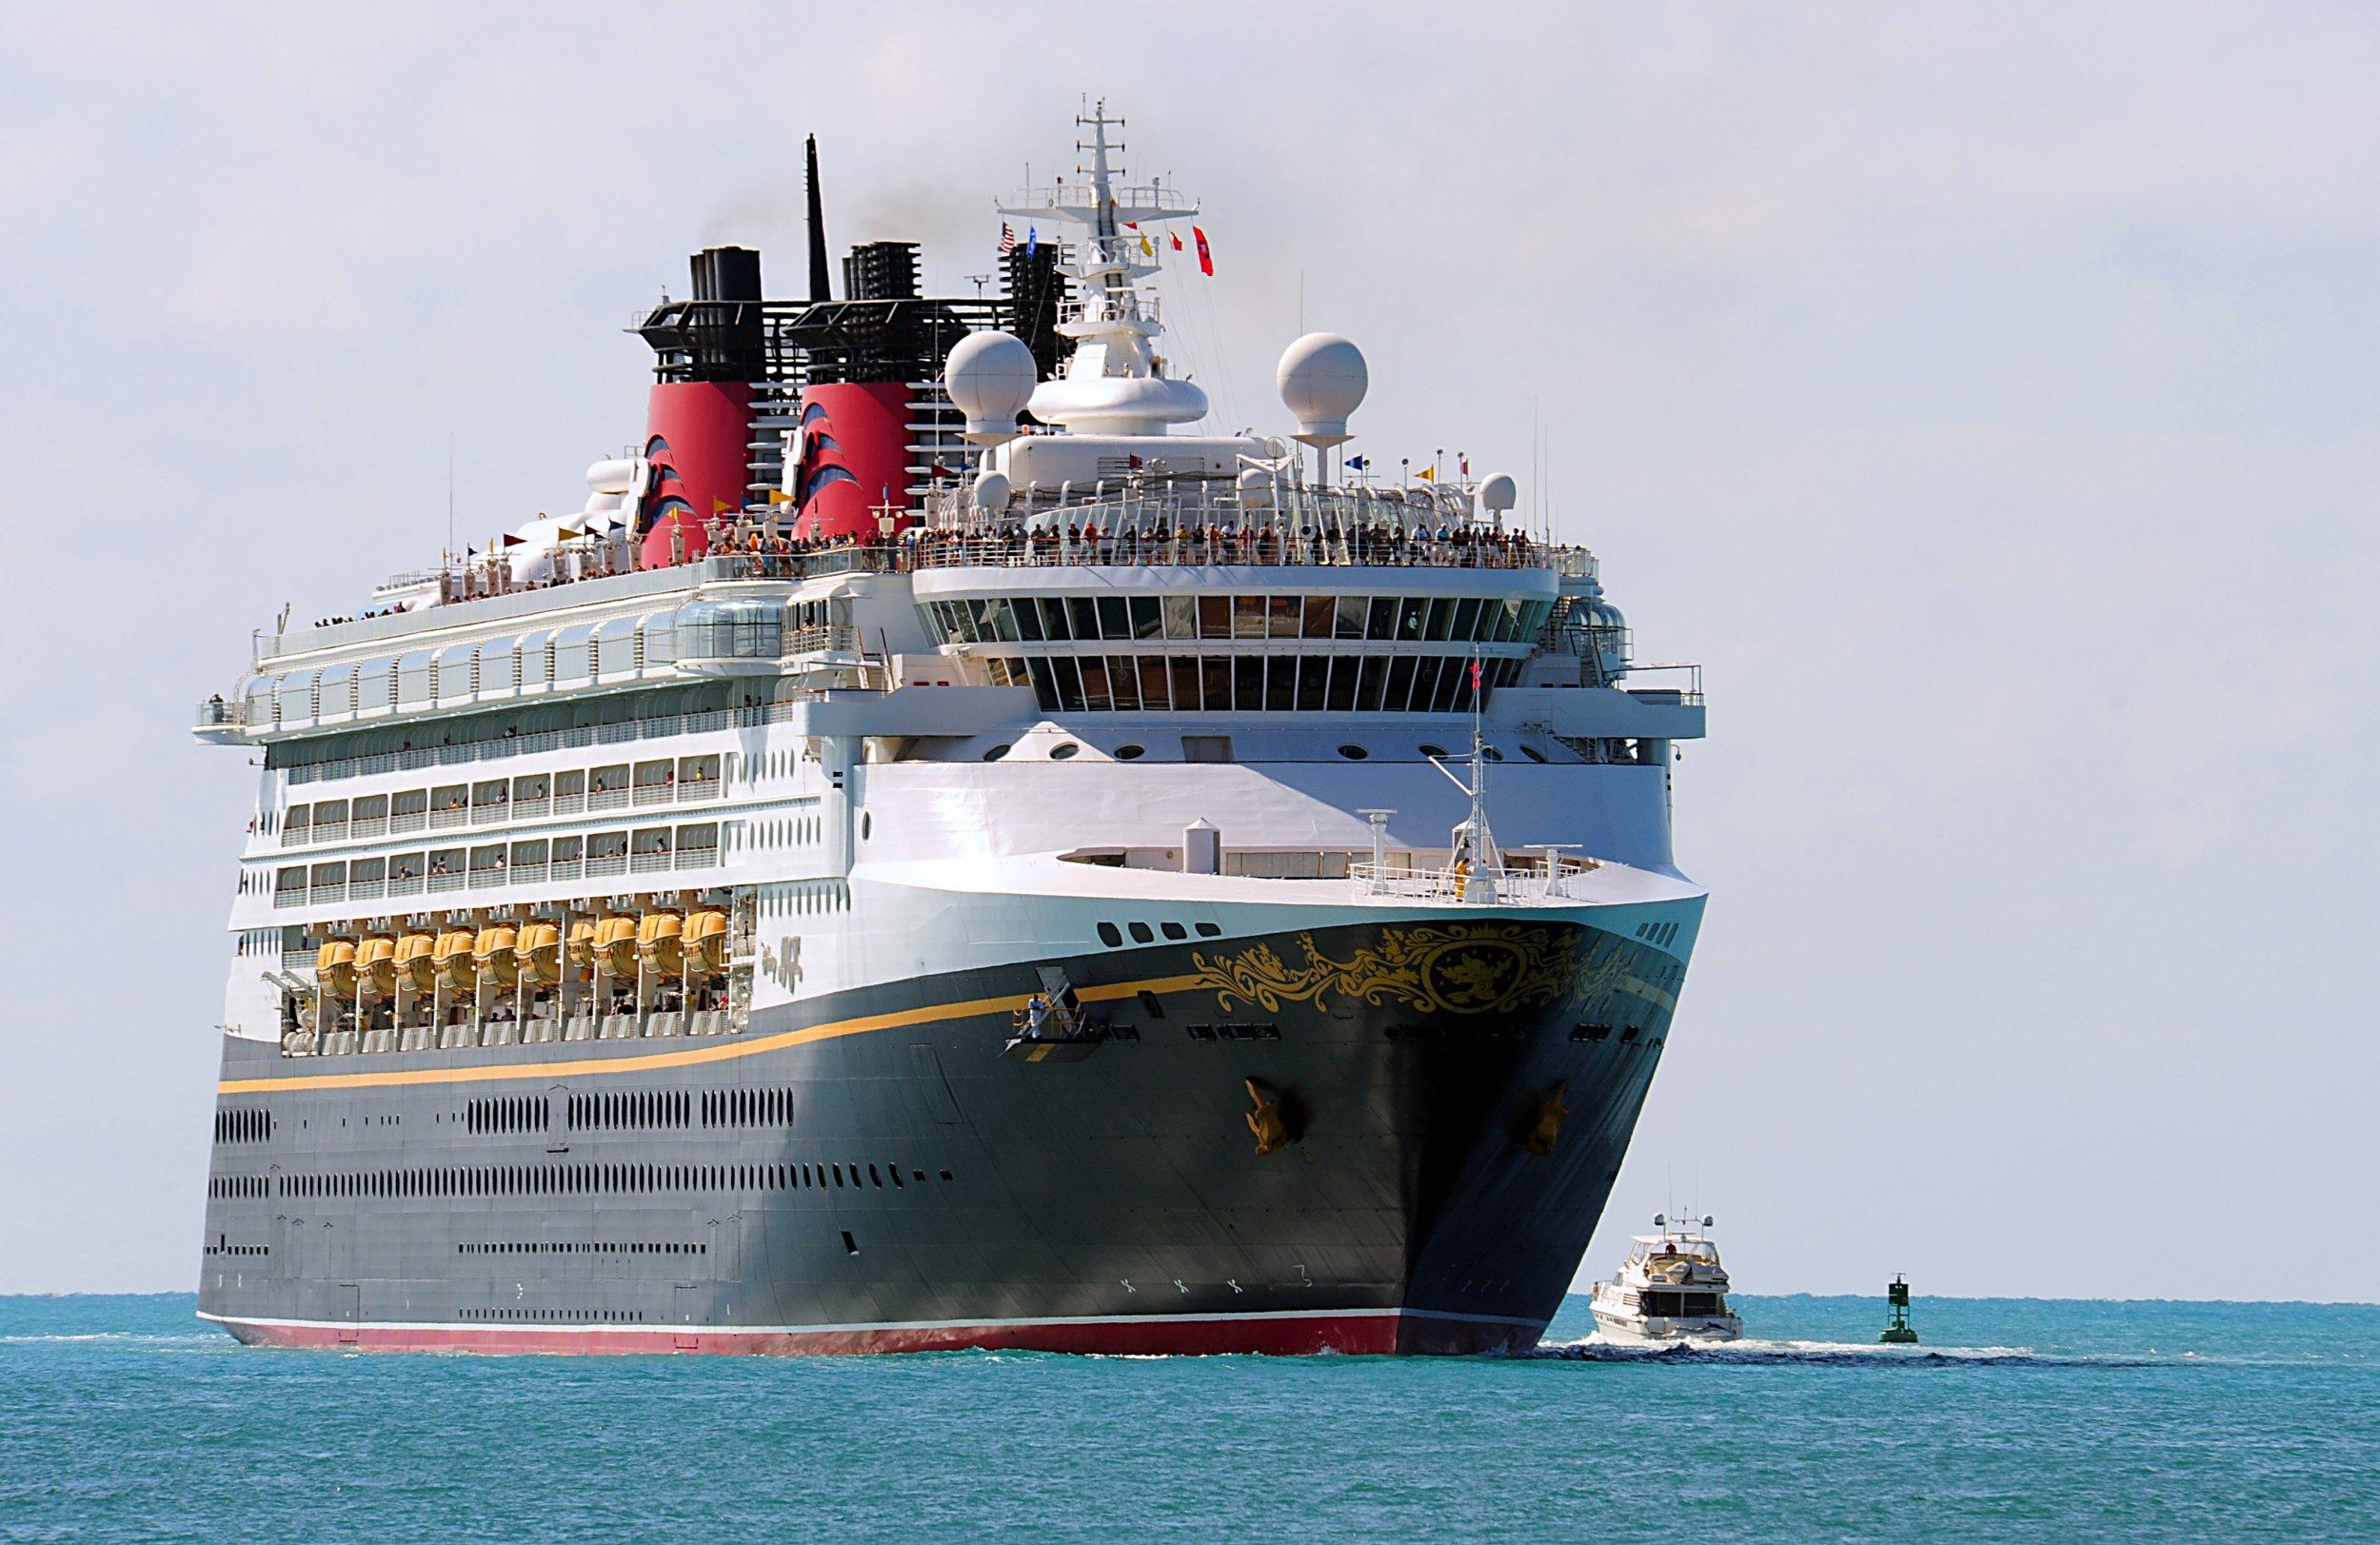 Pregnant Mom Says Disney Cruise Line Denied Family Entry